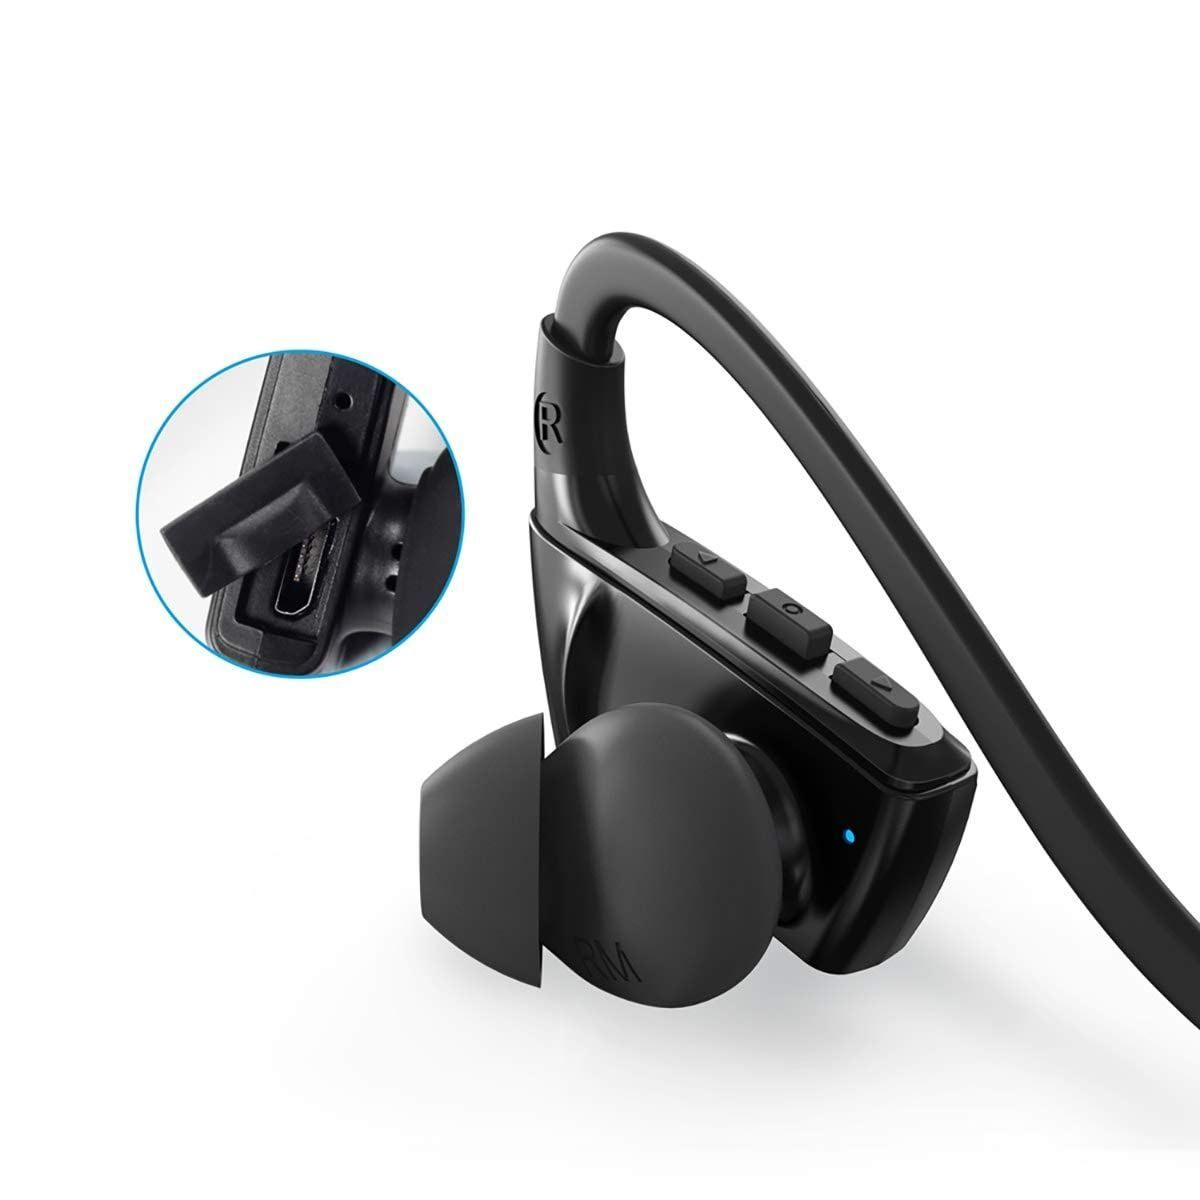 Best True Wireless Earbuds Under 100 Dollars Wireless